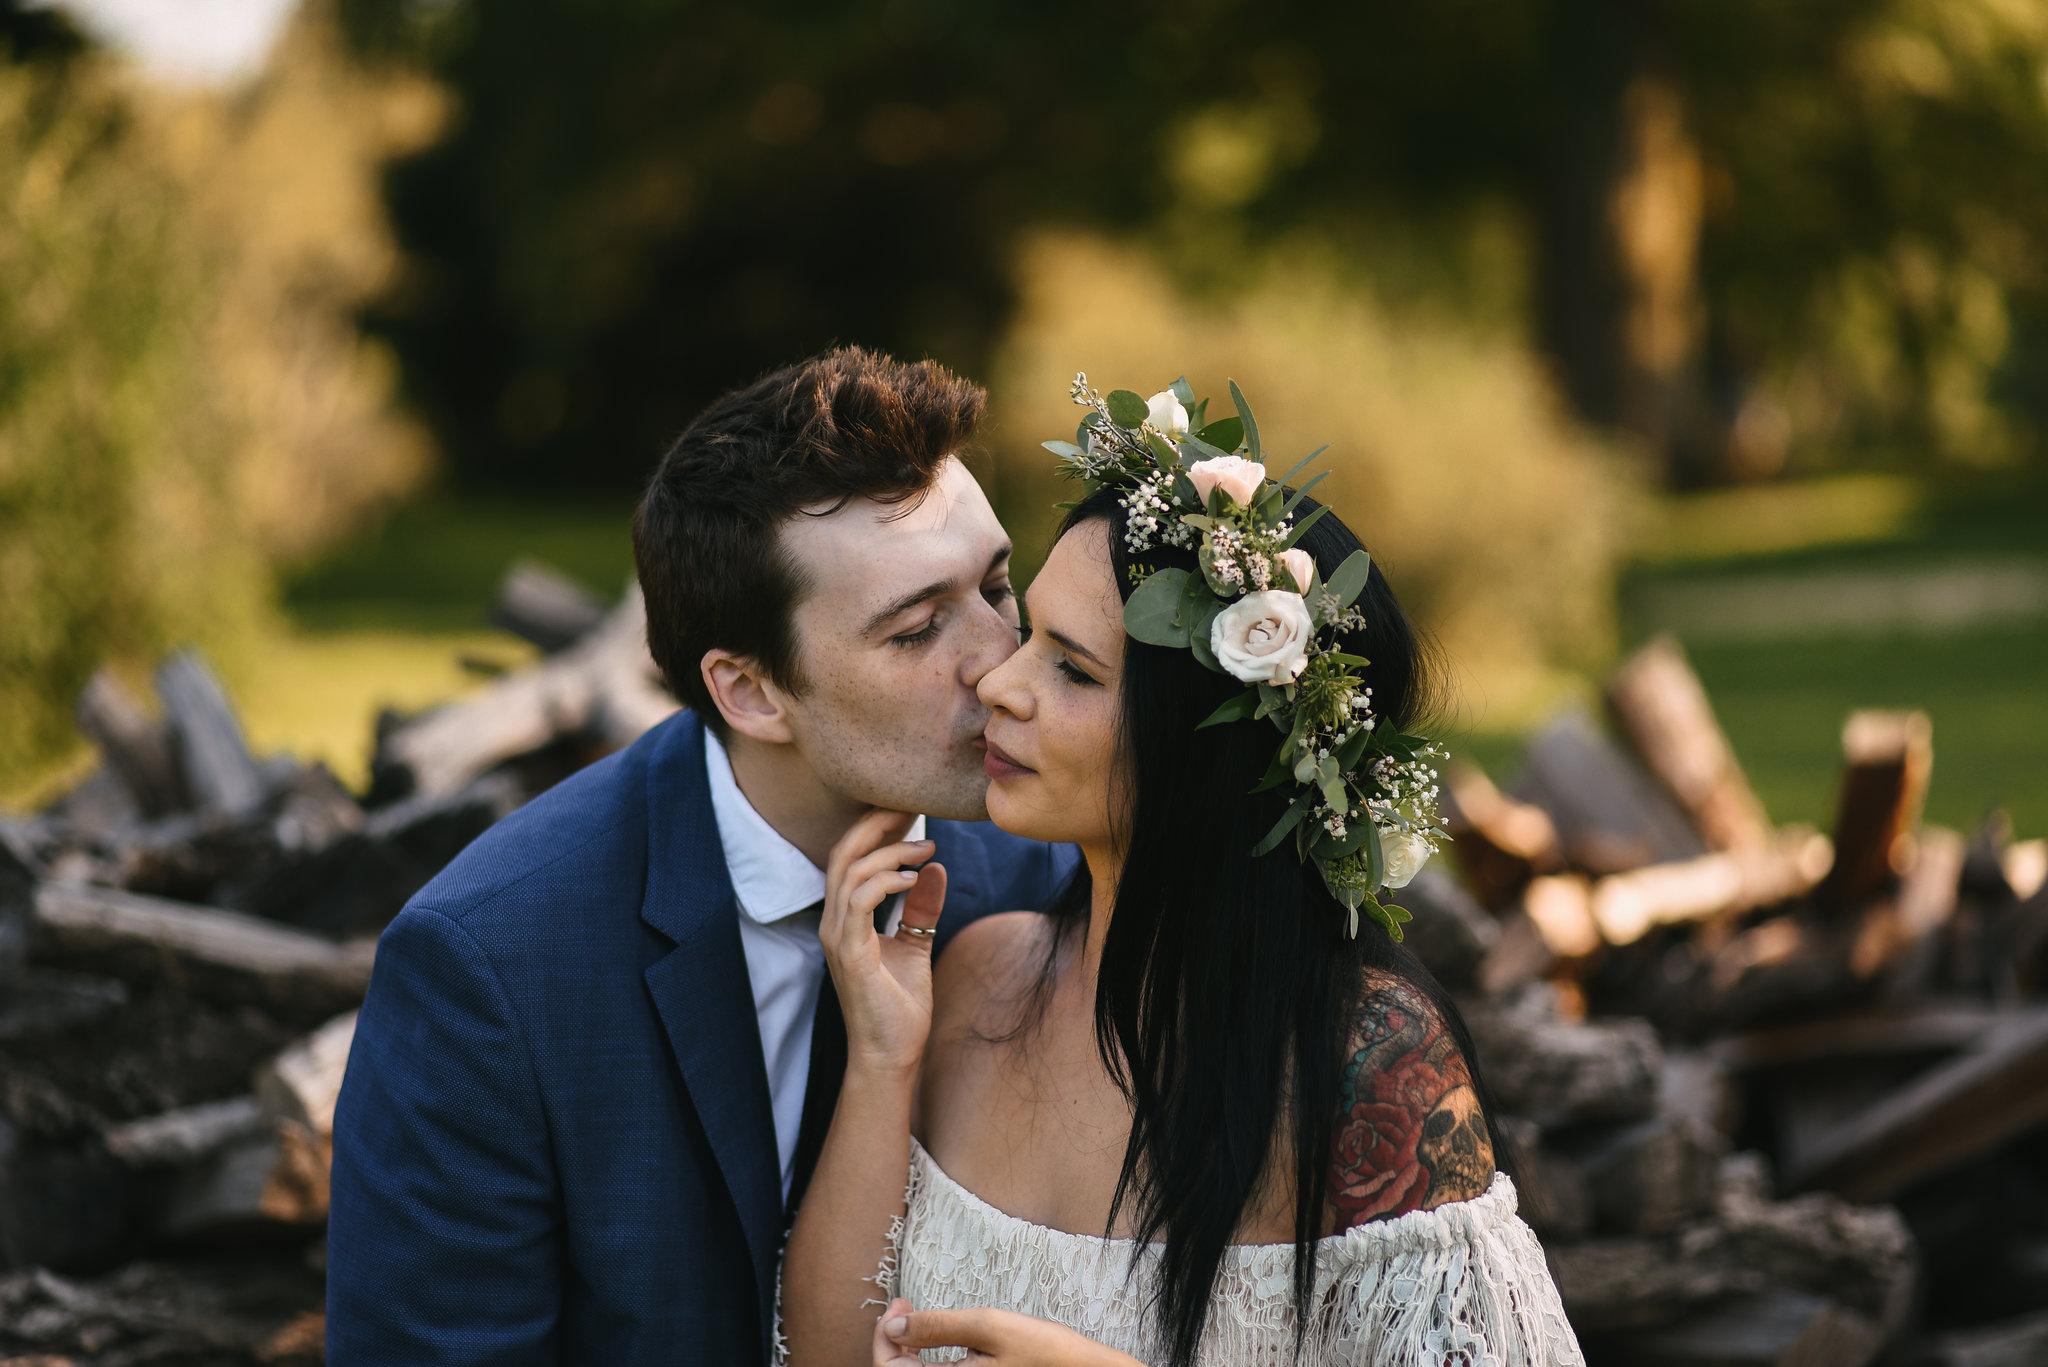 Maryland, Eastern Shore, Baltimore Wedding Photographer, Romantic, Boho, Backyard Wedding, Nature, Groom Kissing Bride on the Cheek, Michael Designs Florist, Tattooed Bride